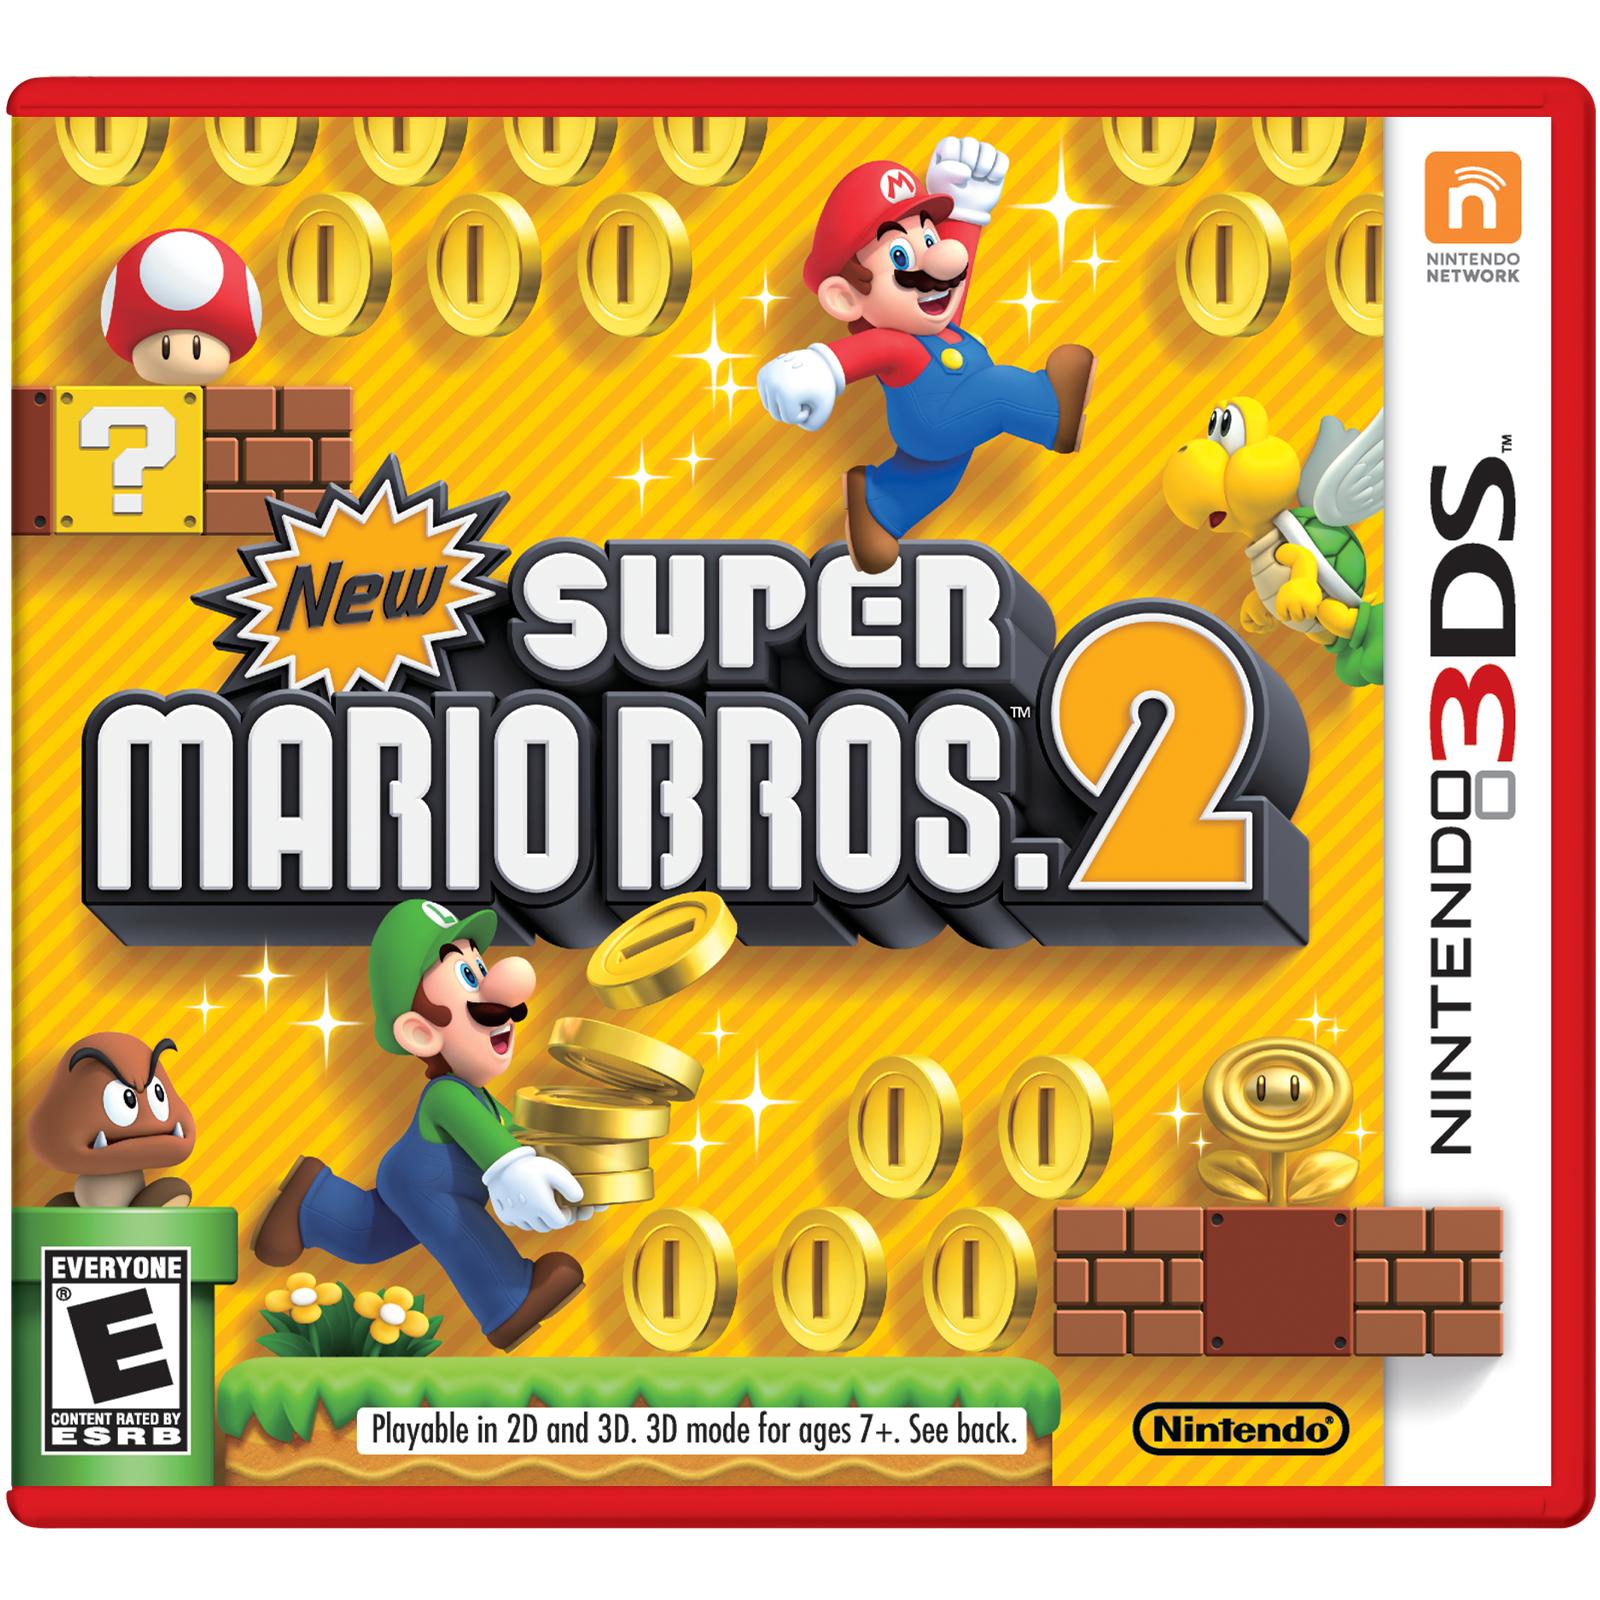 Details About New Super Mario Bros 2 Nintendo 3ds 2012 Mario Bros Nintendo 3ds Super Mario Bros